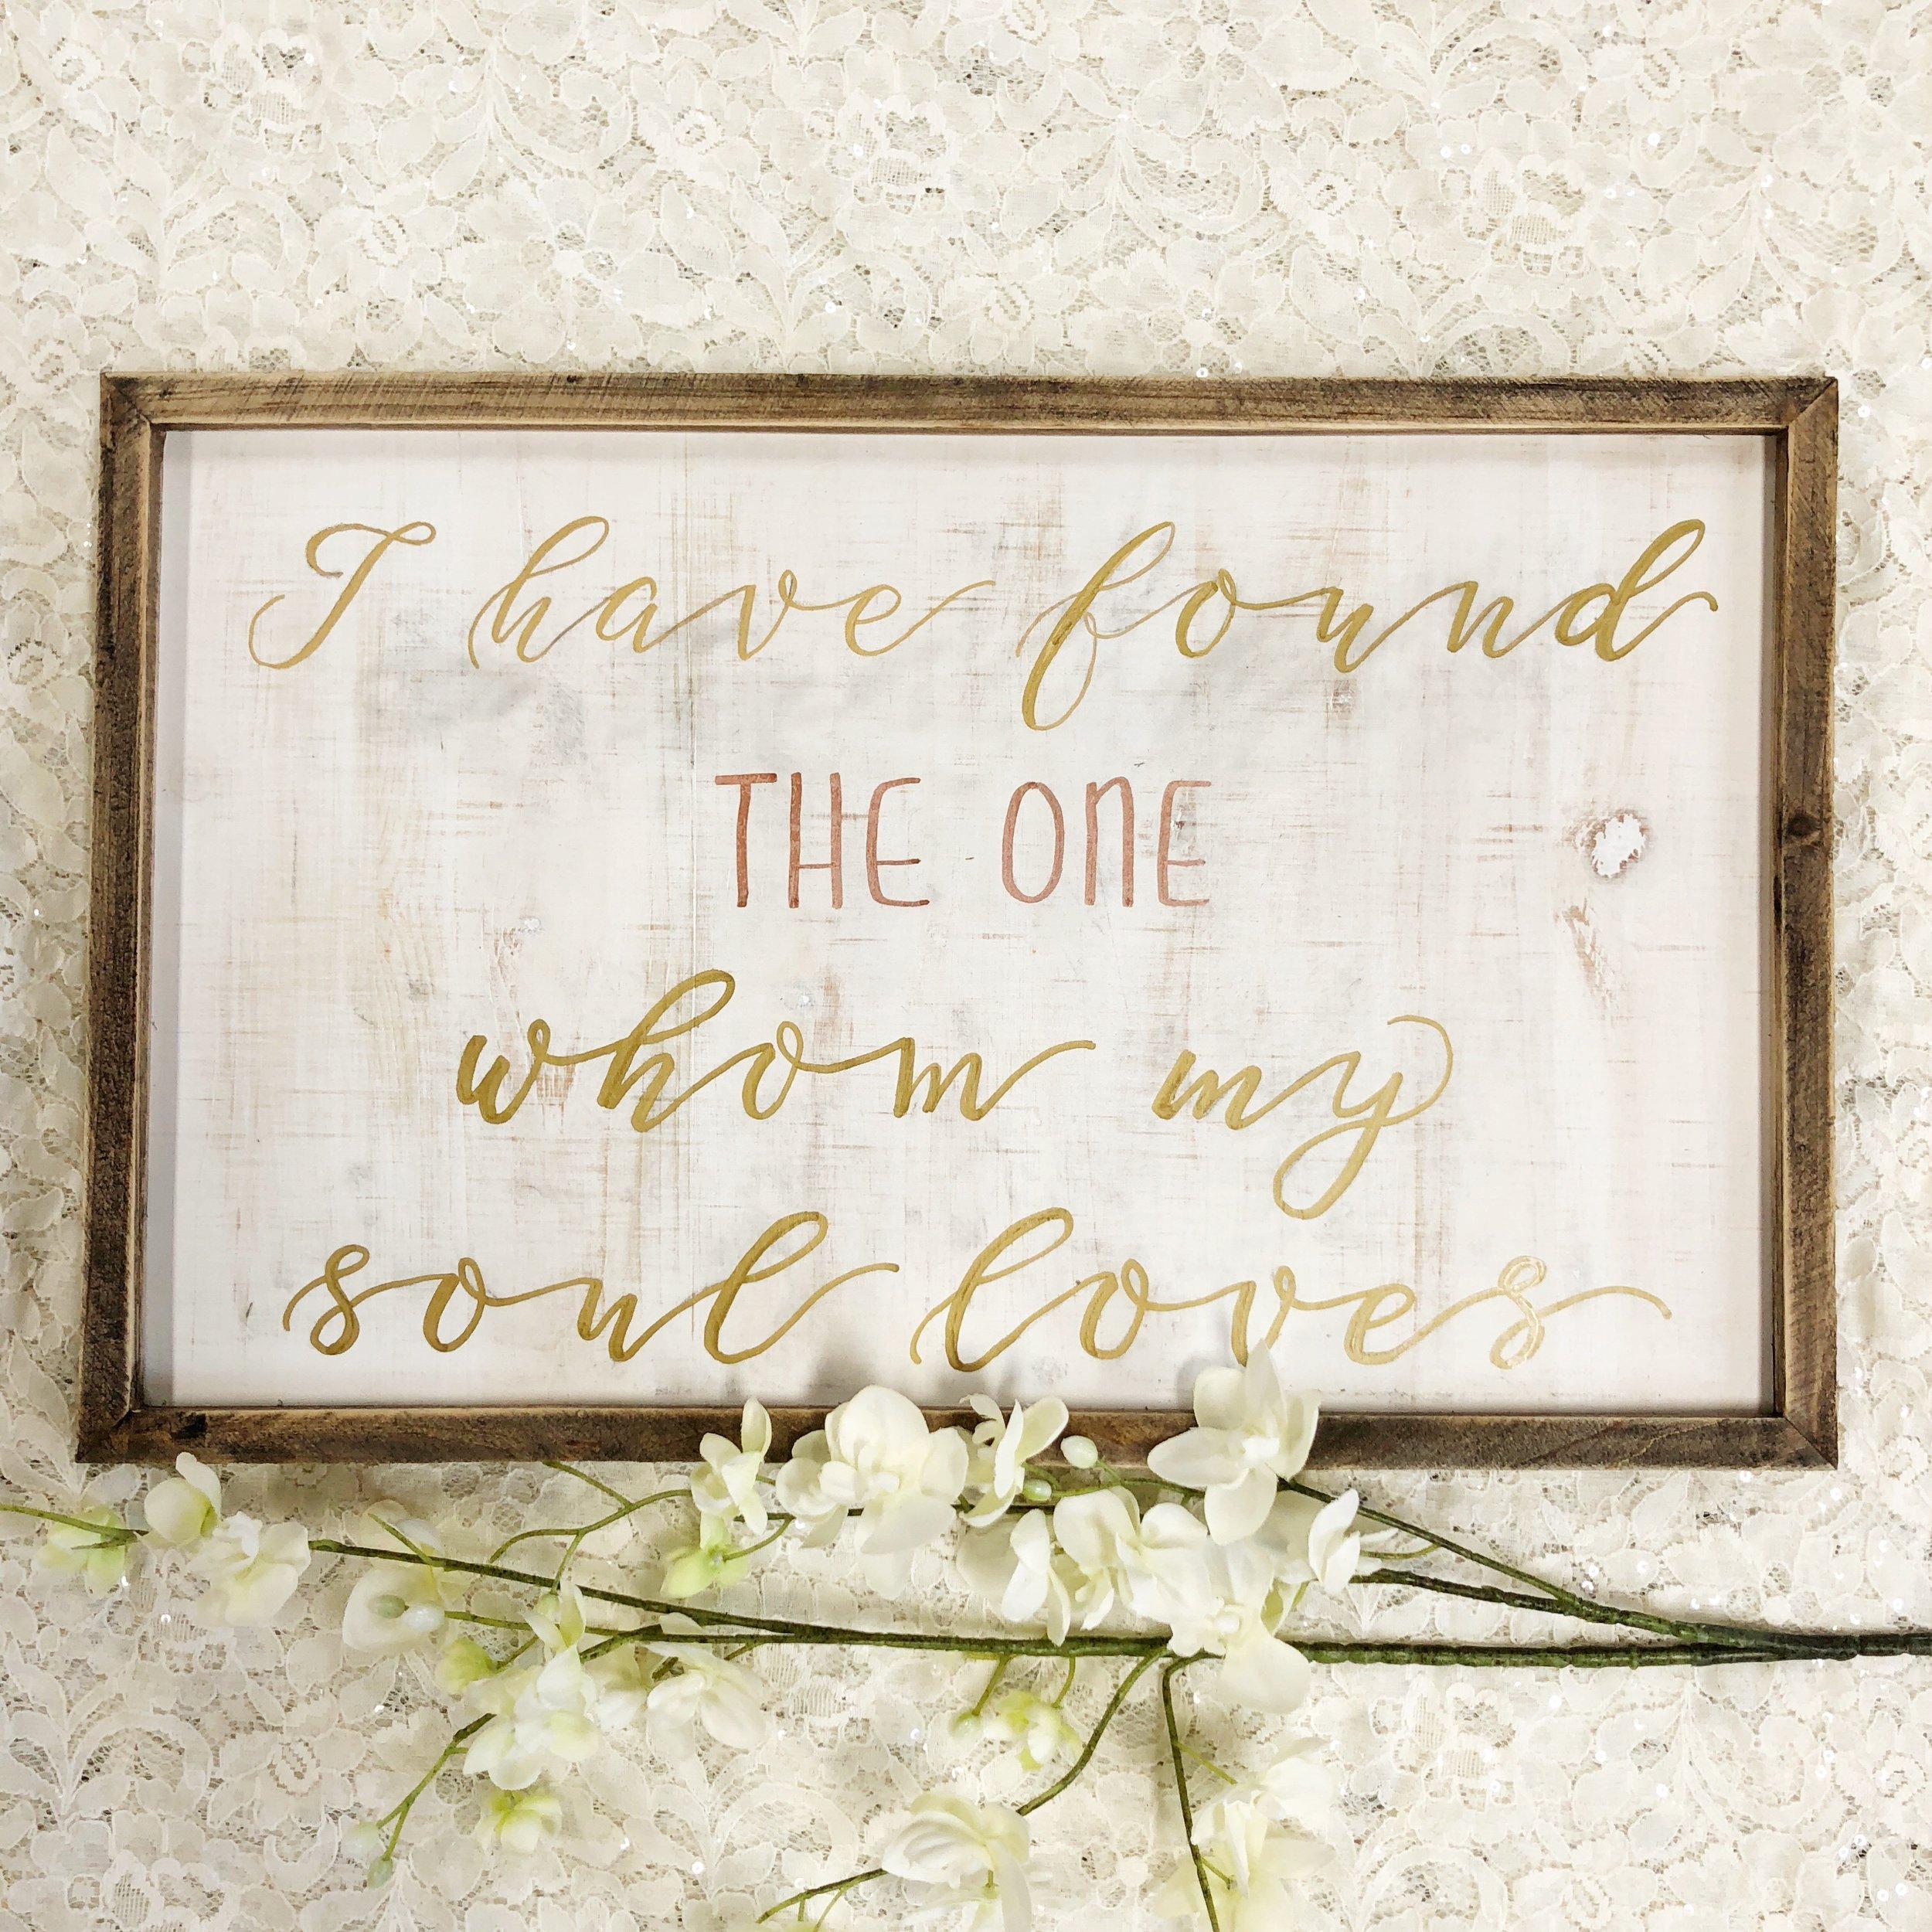 Central PA, York PA, JesSmith Designs, custom, wedding, invitations, bridal, announcements, save the date, baby, hanover, calligraphy, baltimore, wedding invitations, lancaster, gettysburg-02-17 12.15.56.jpg